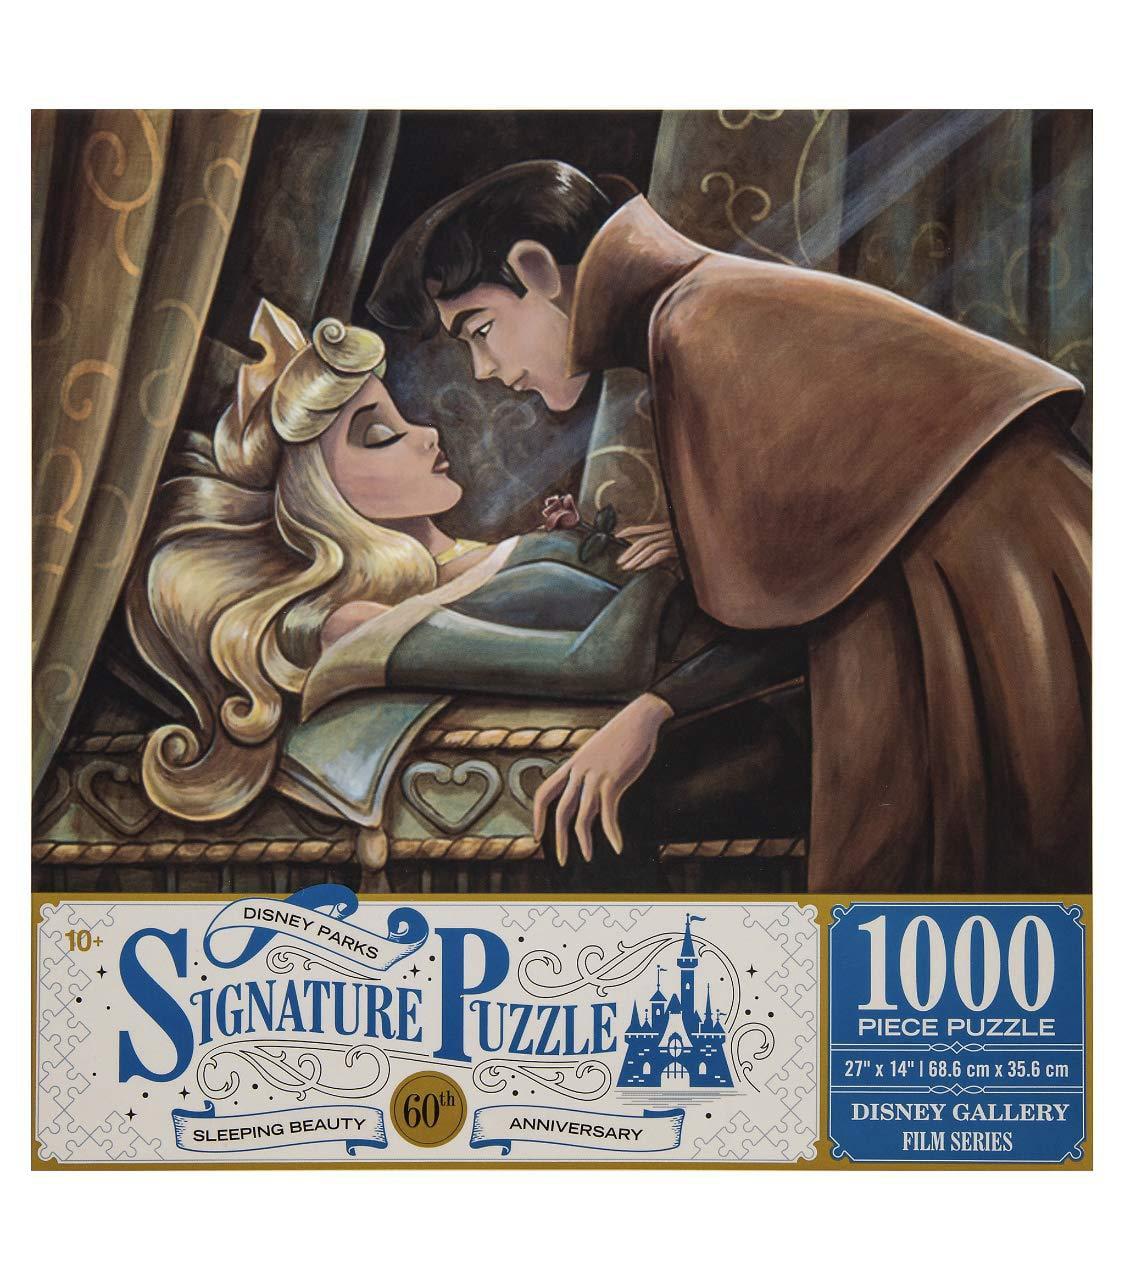 56 Piece Jigsaw puzzle Sleeping Beauty Princess Aurora Canvas puzzle